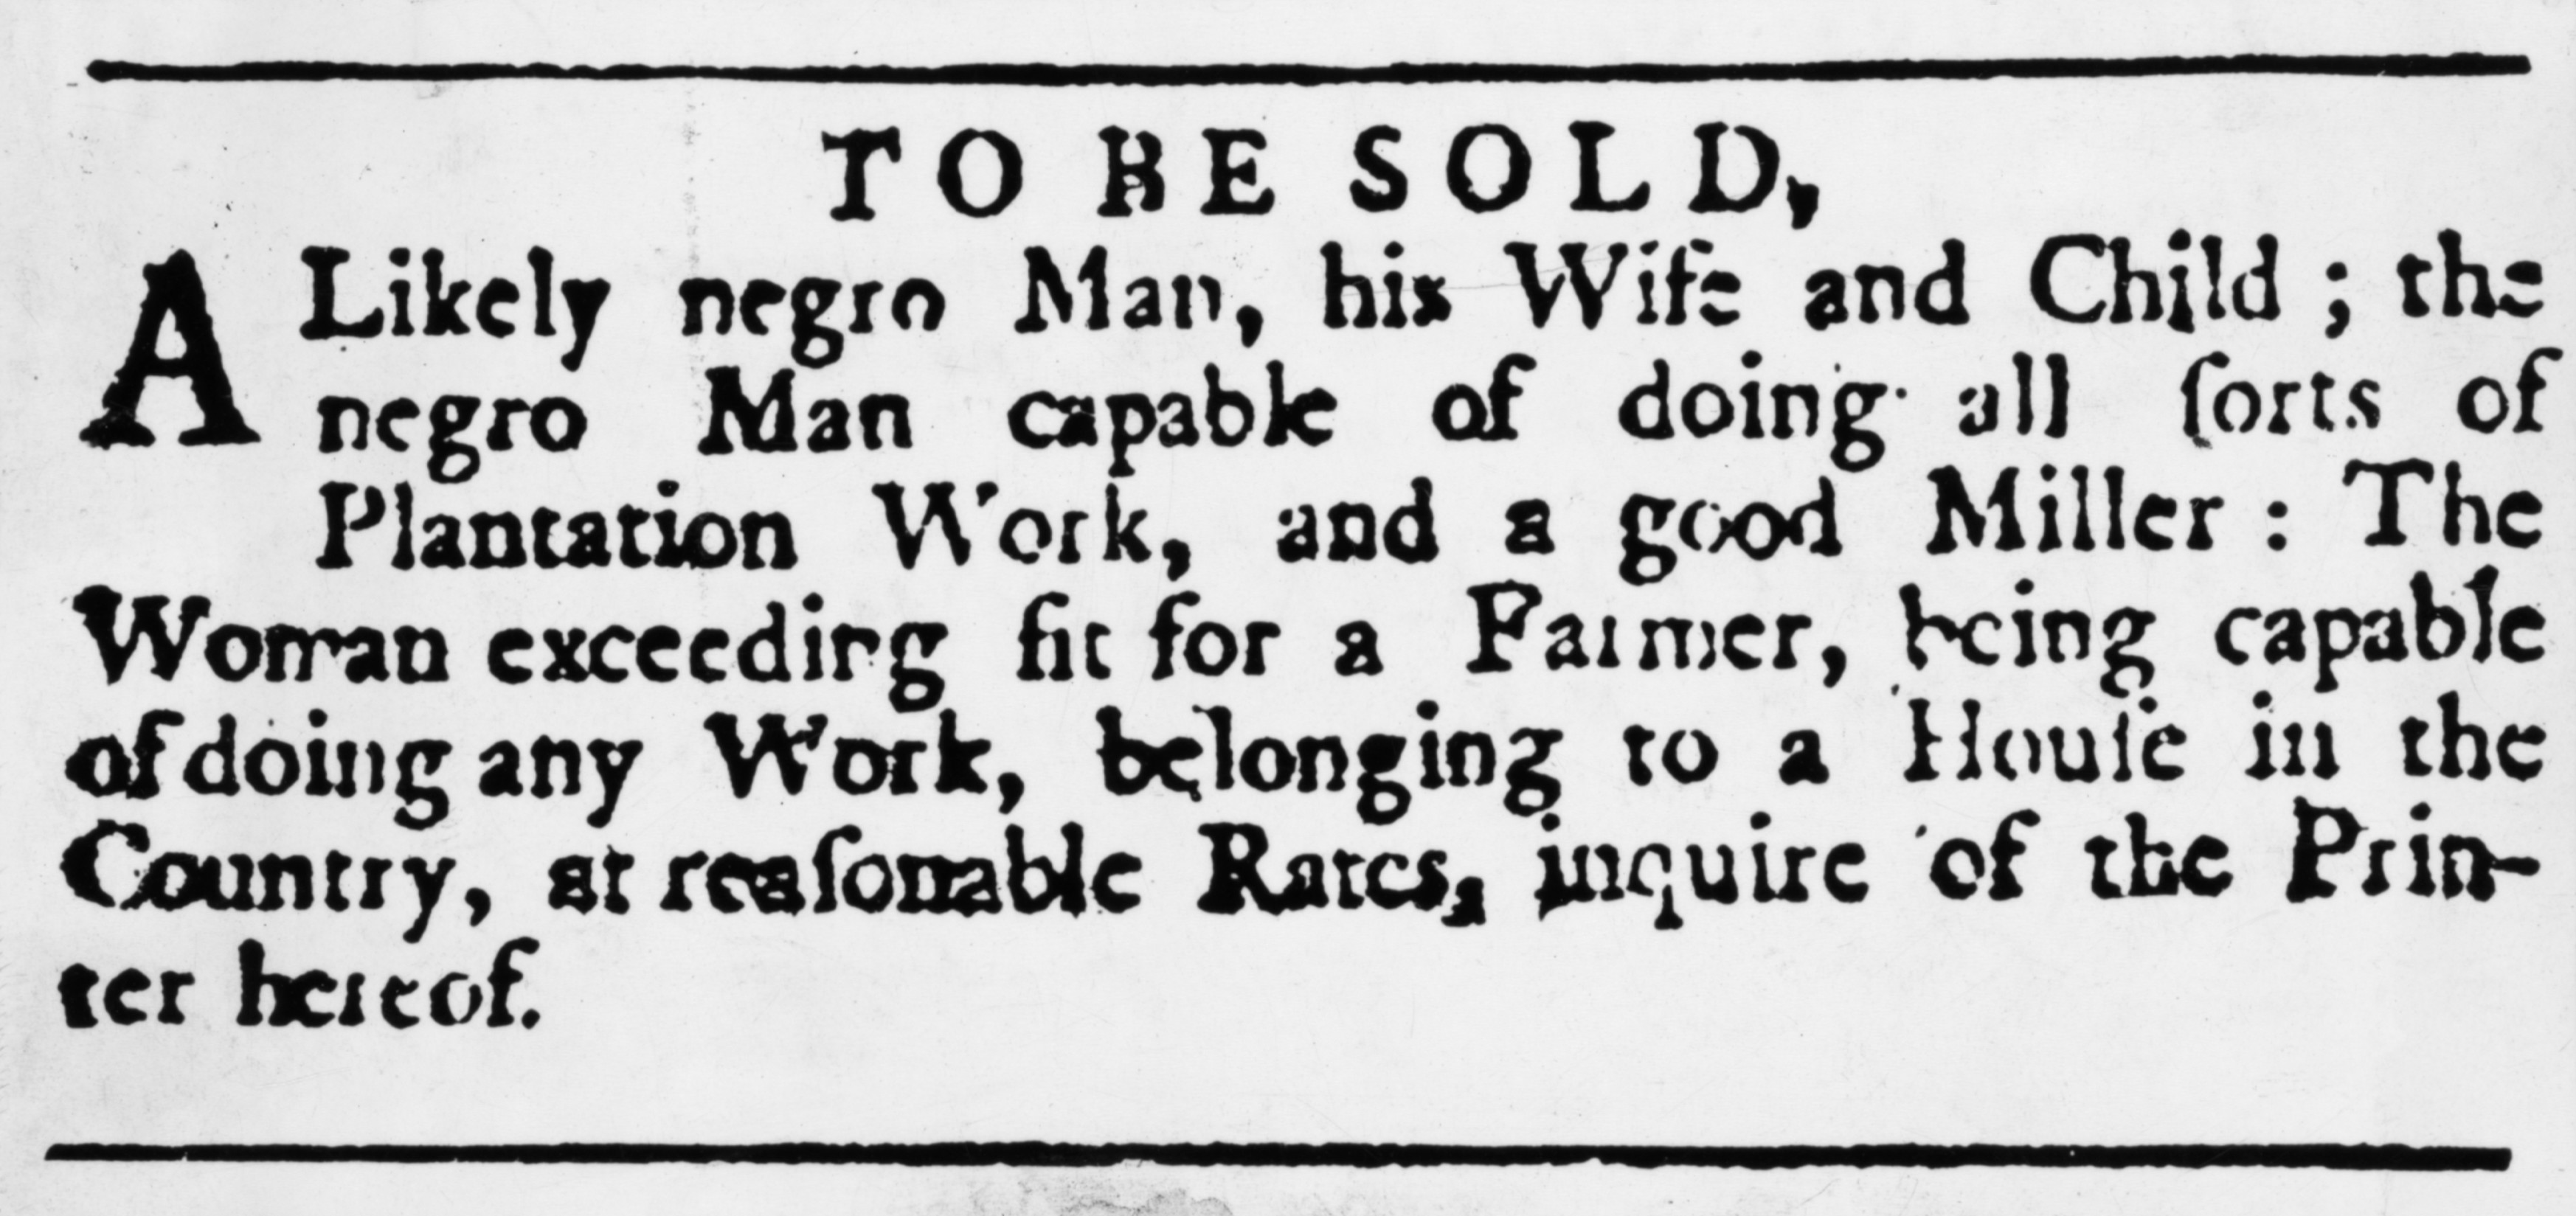 Newspaper Ad Offering Slaves For Sale